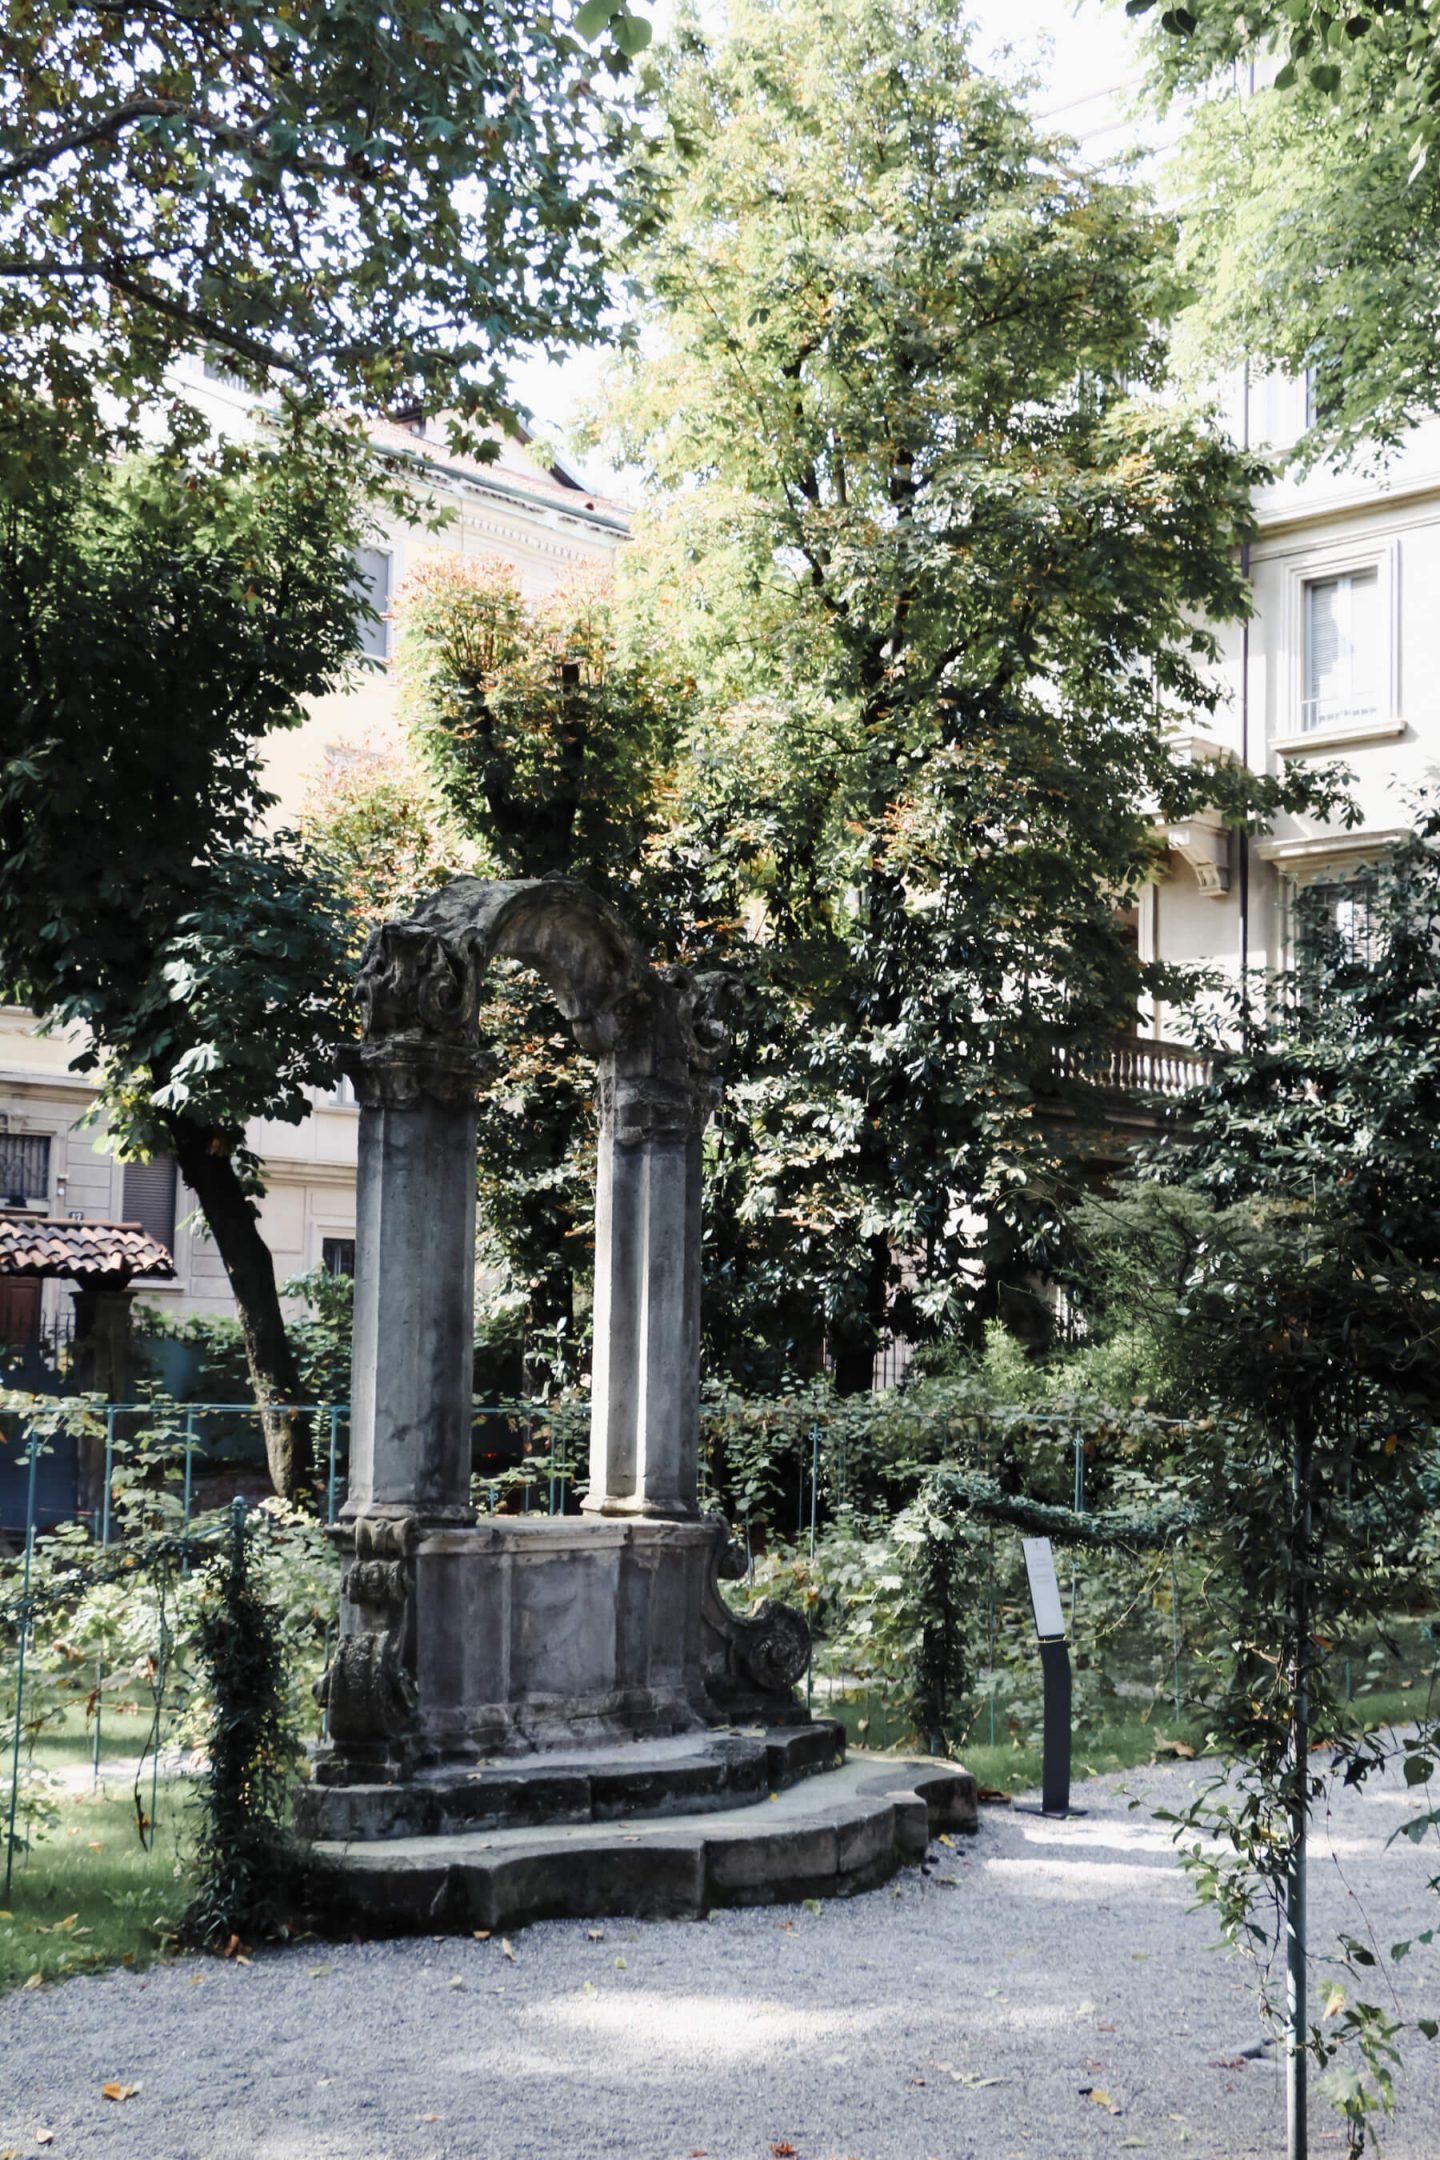 Sababok Milanguide LaVignadiLeonardo 1440x2160